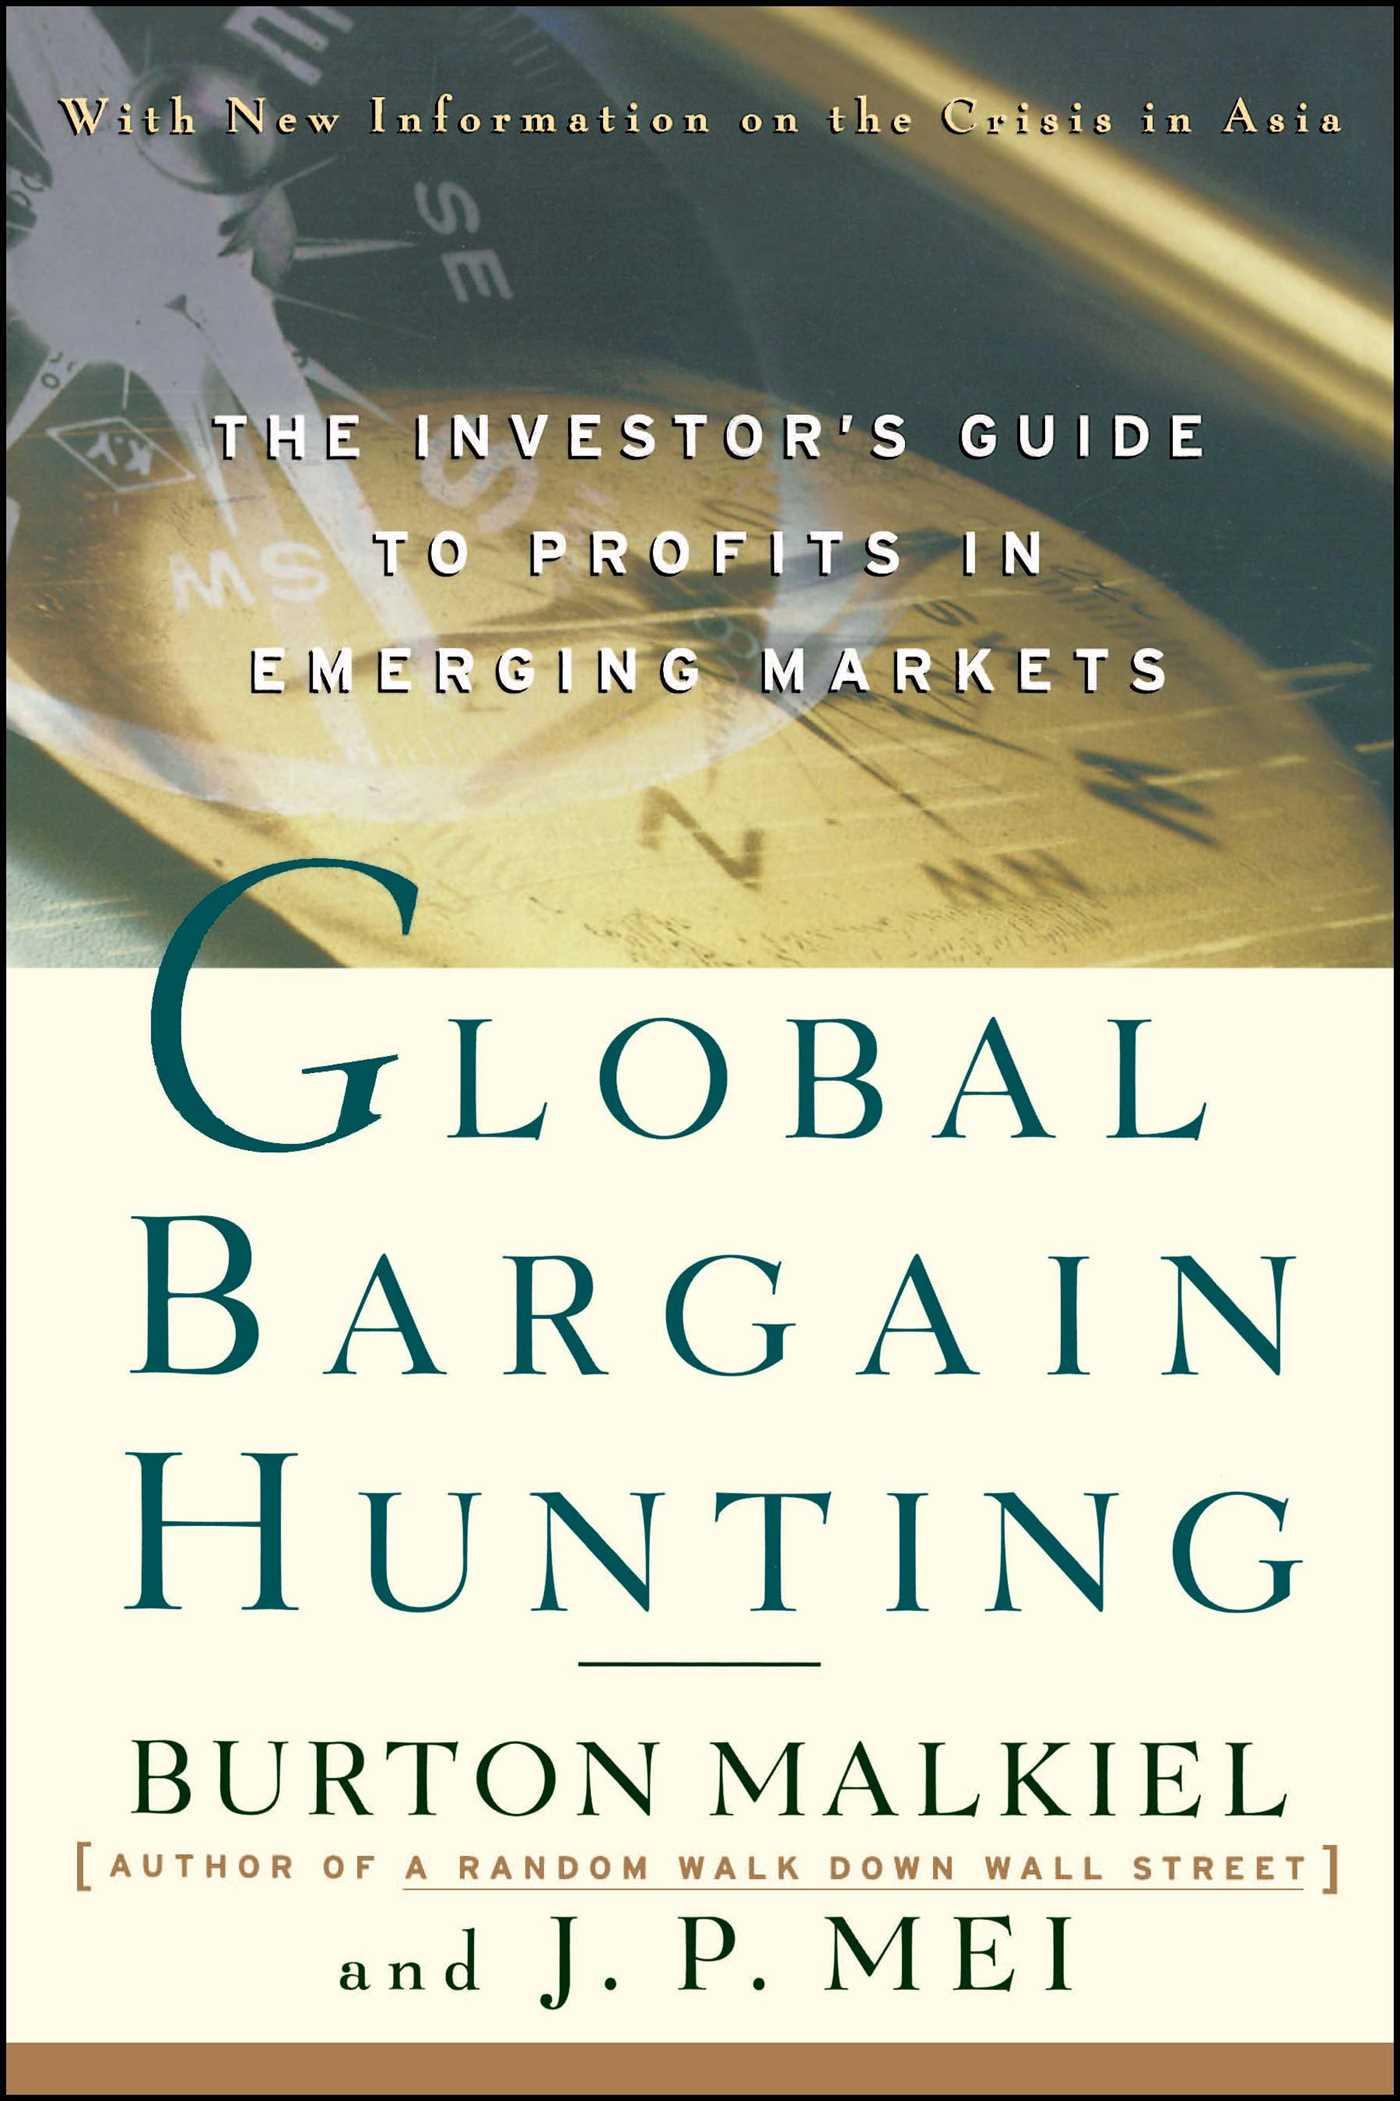 Global bargain hunting 9780684848082 hr